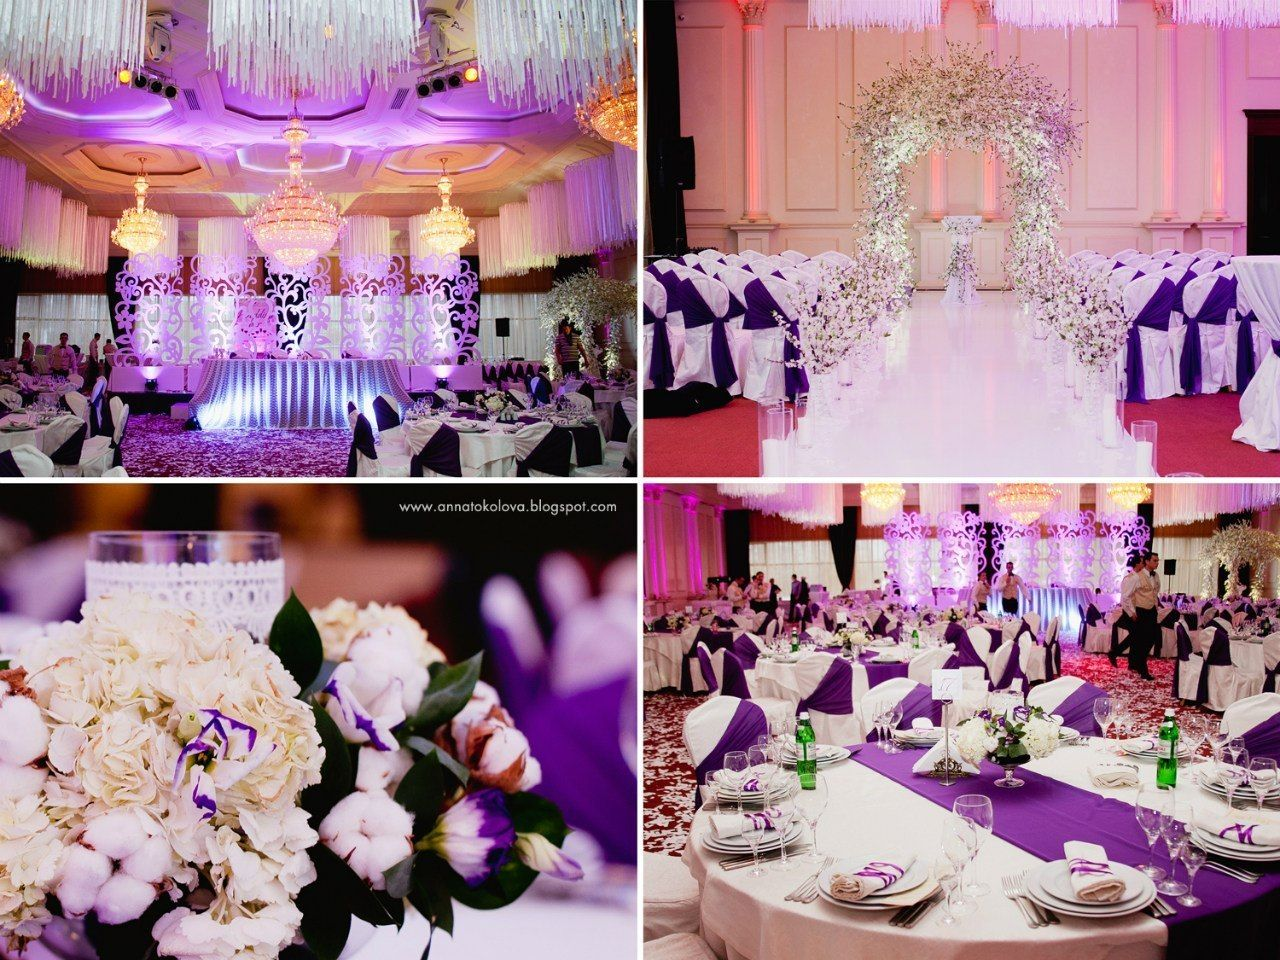 Lilac wedding decoration ideas  IxAdmGpYg   wcolors  Pinterest